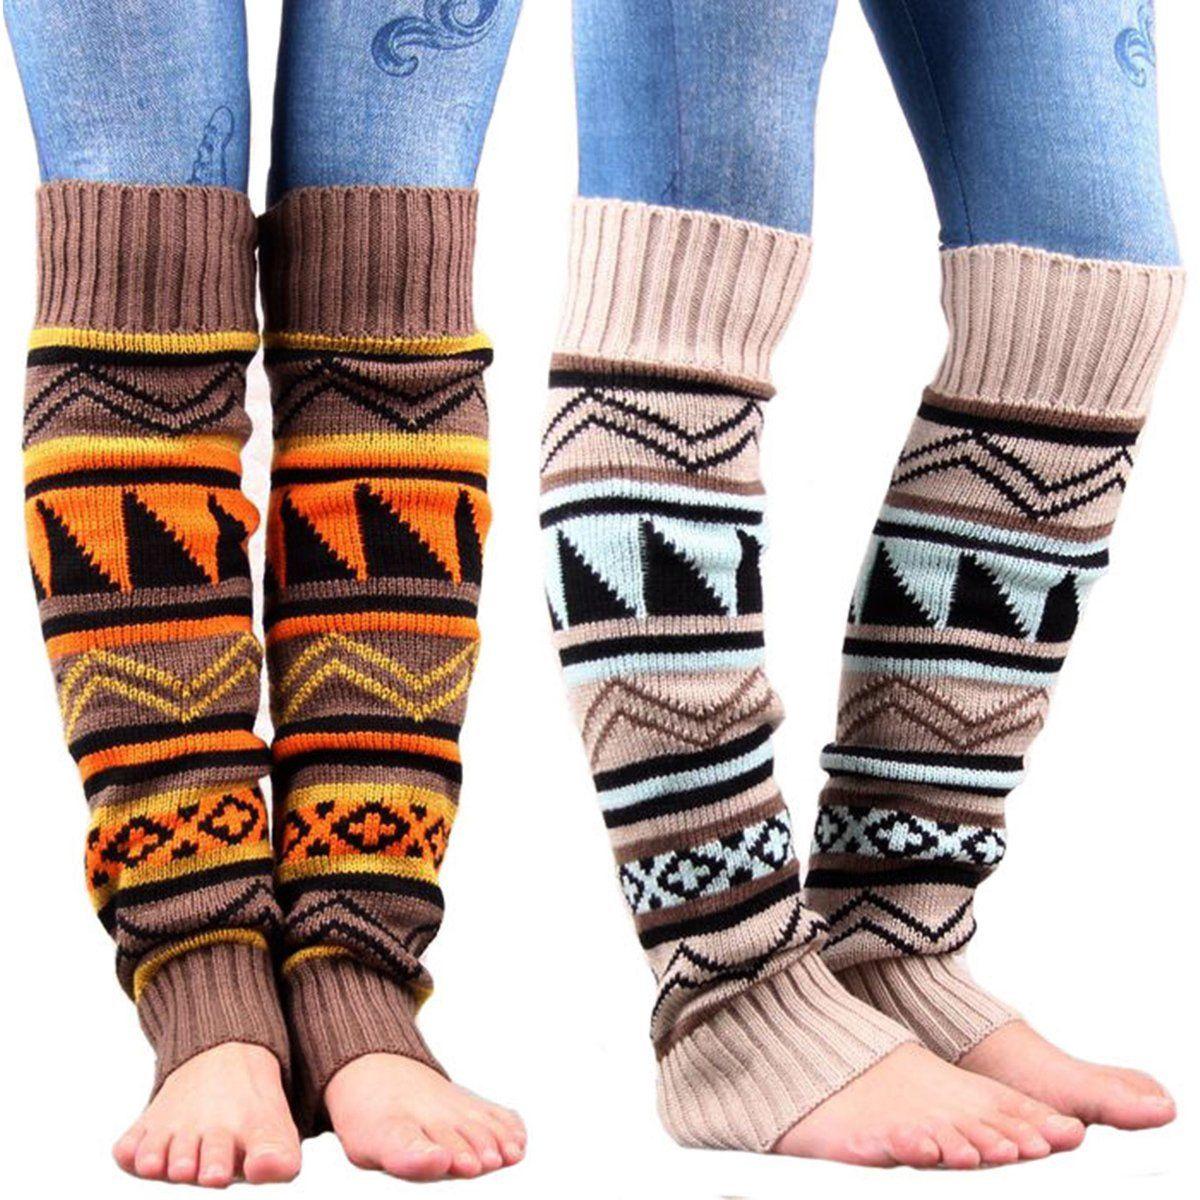 Winter womens gaiters Crochet Knitted Stocking Boot Cuffs Topper Footless Leg Warmers Trim Bohemian Stockings knee high socks Лосины